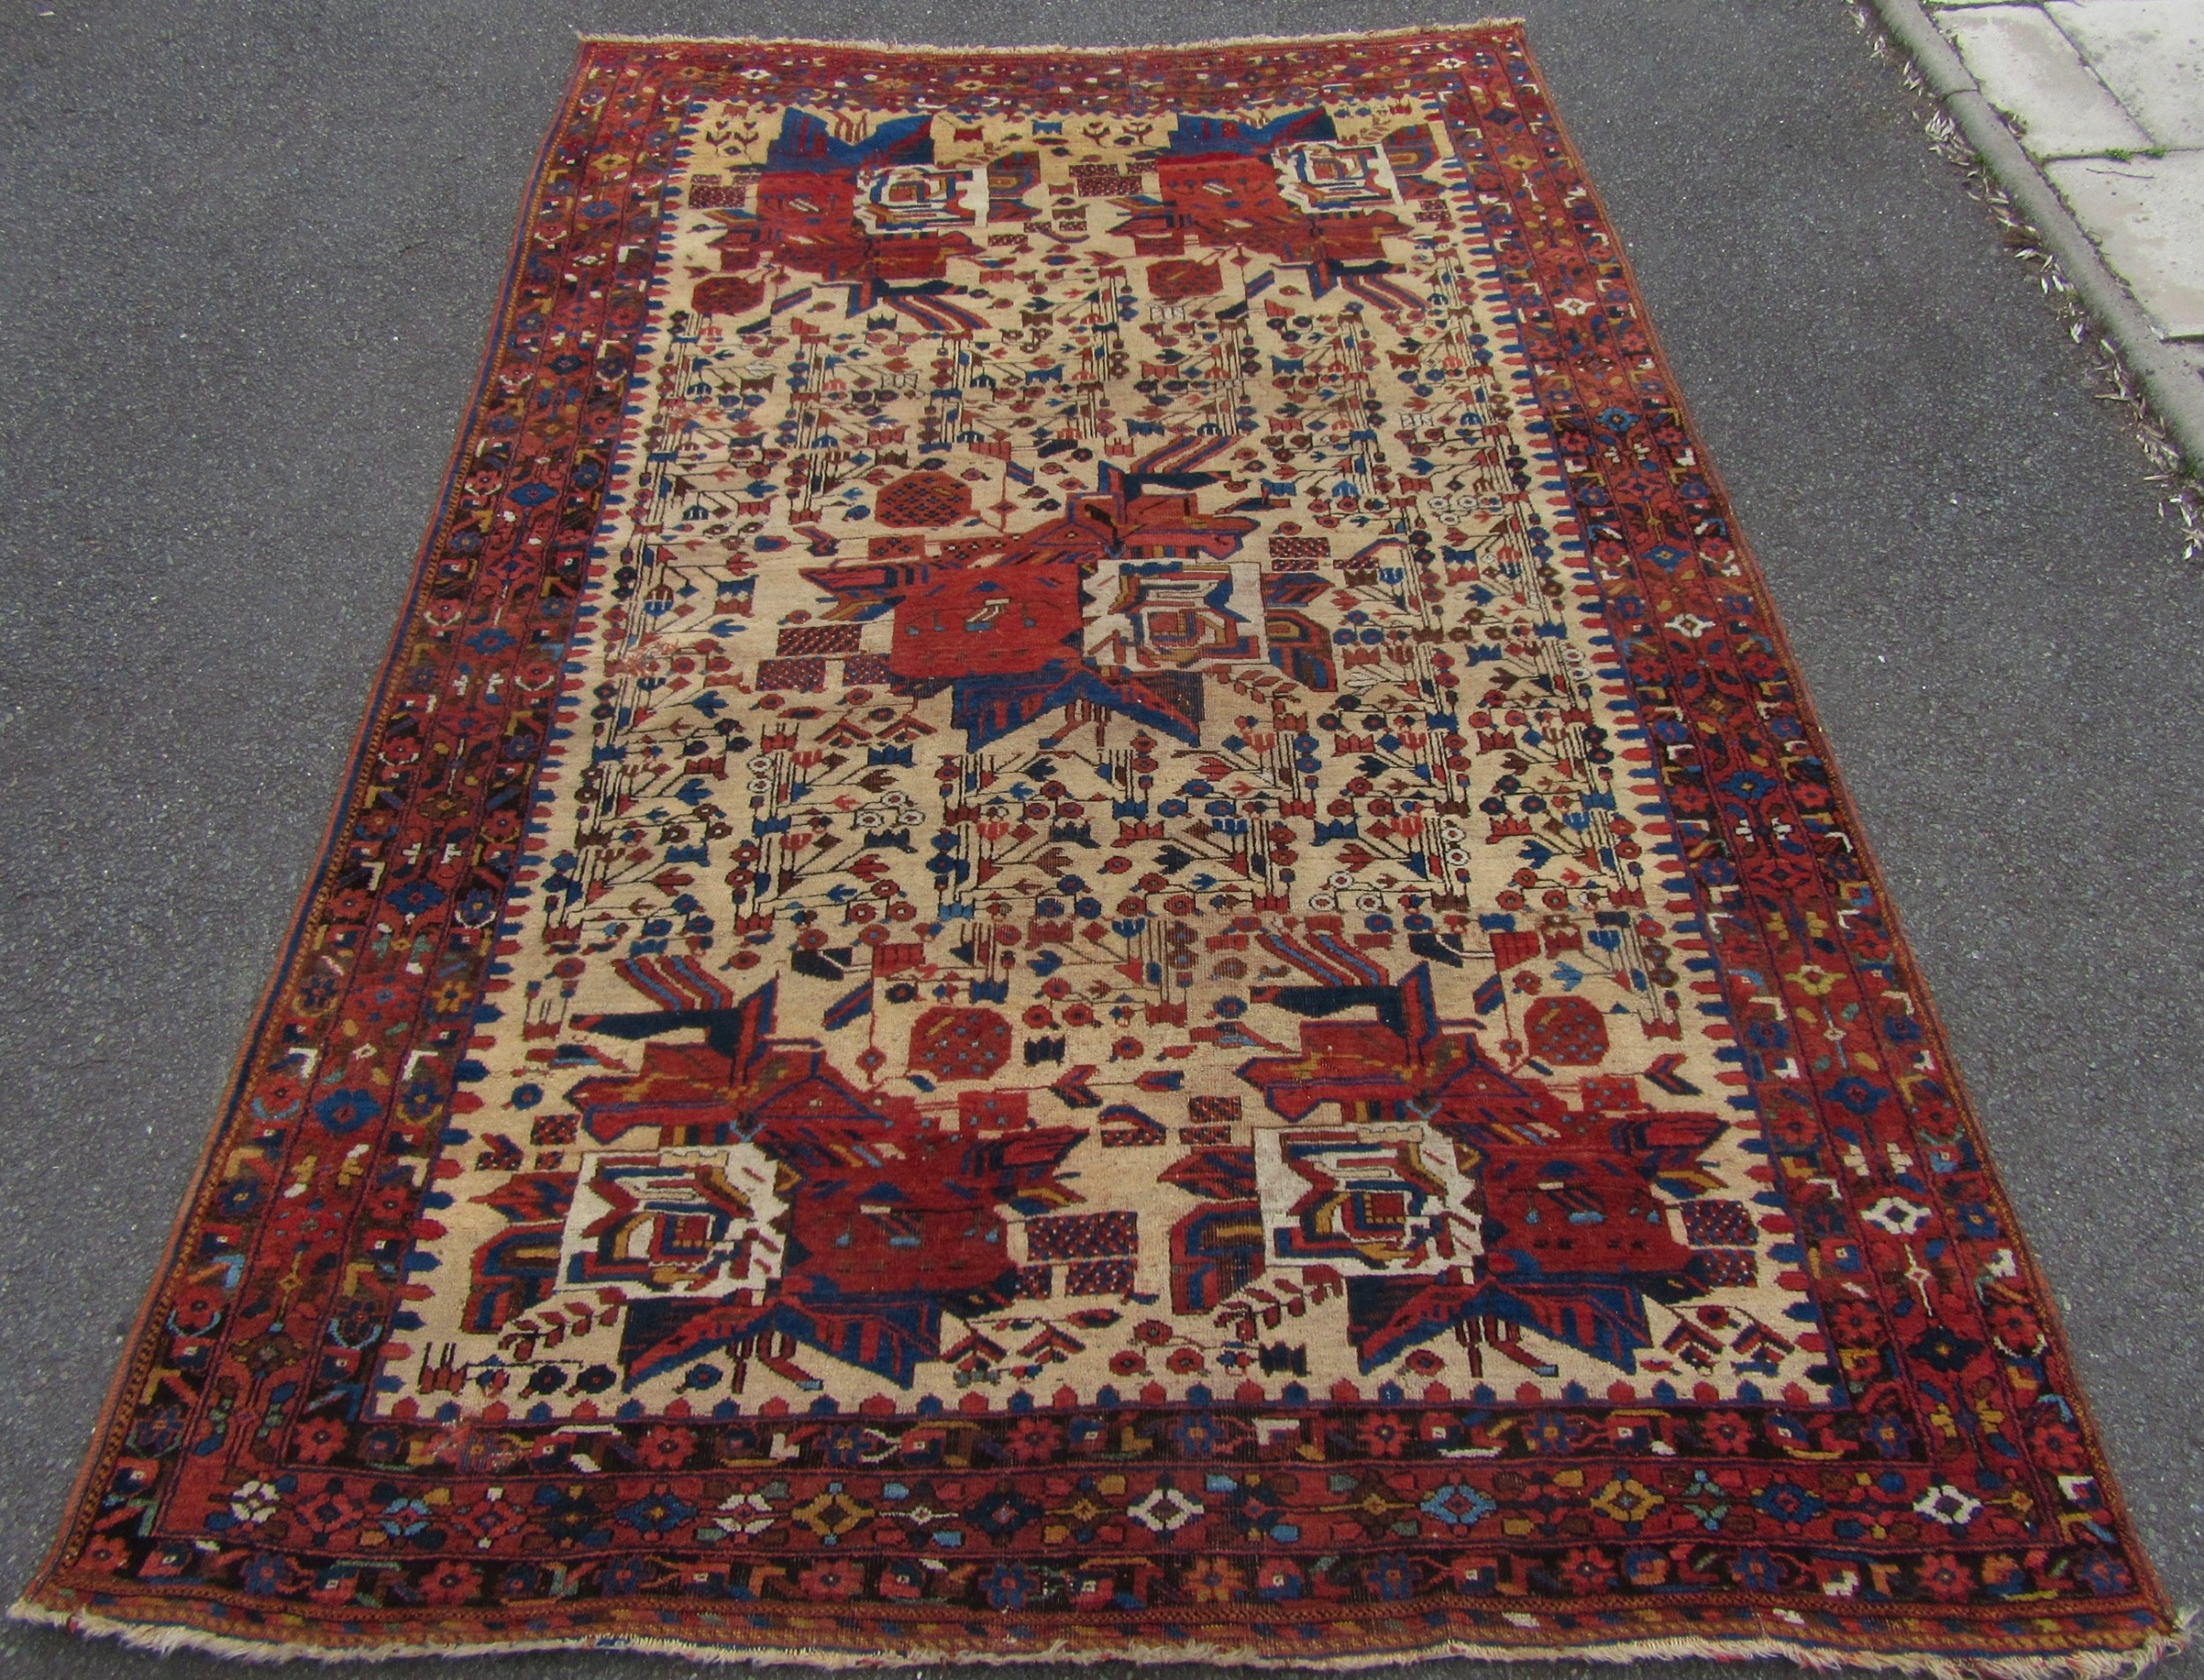 rare pattern antique persian afshar tribal rug scarce design